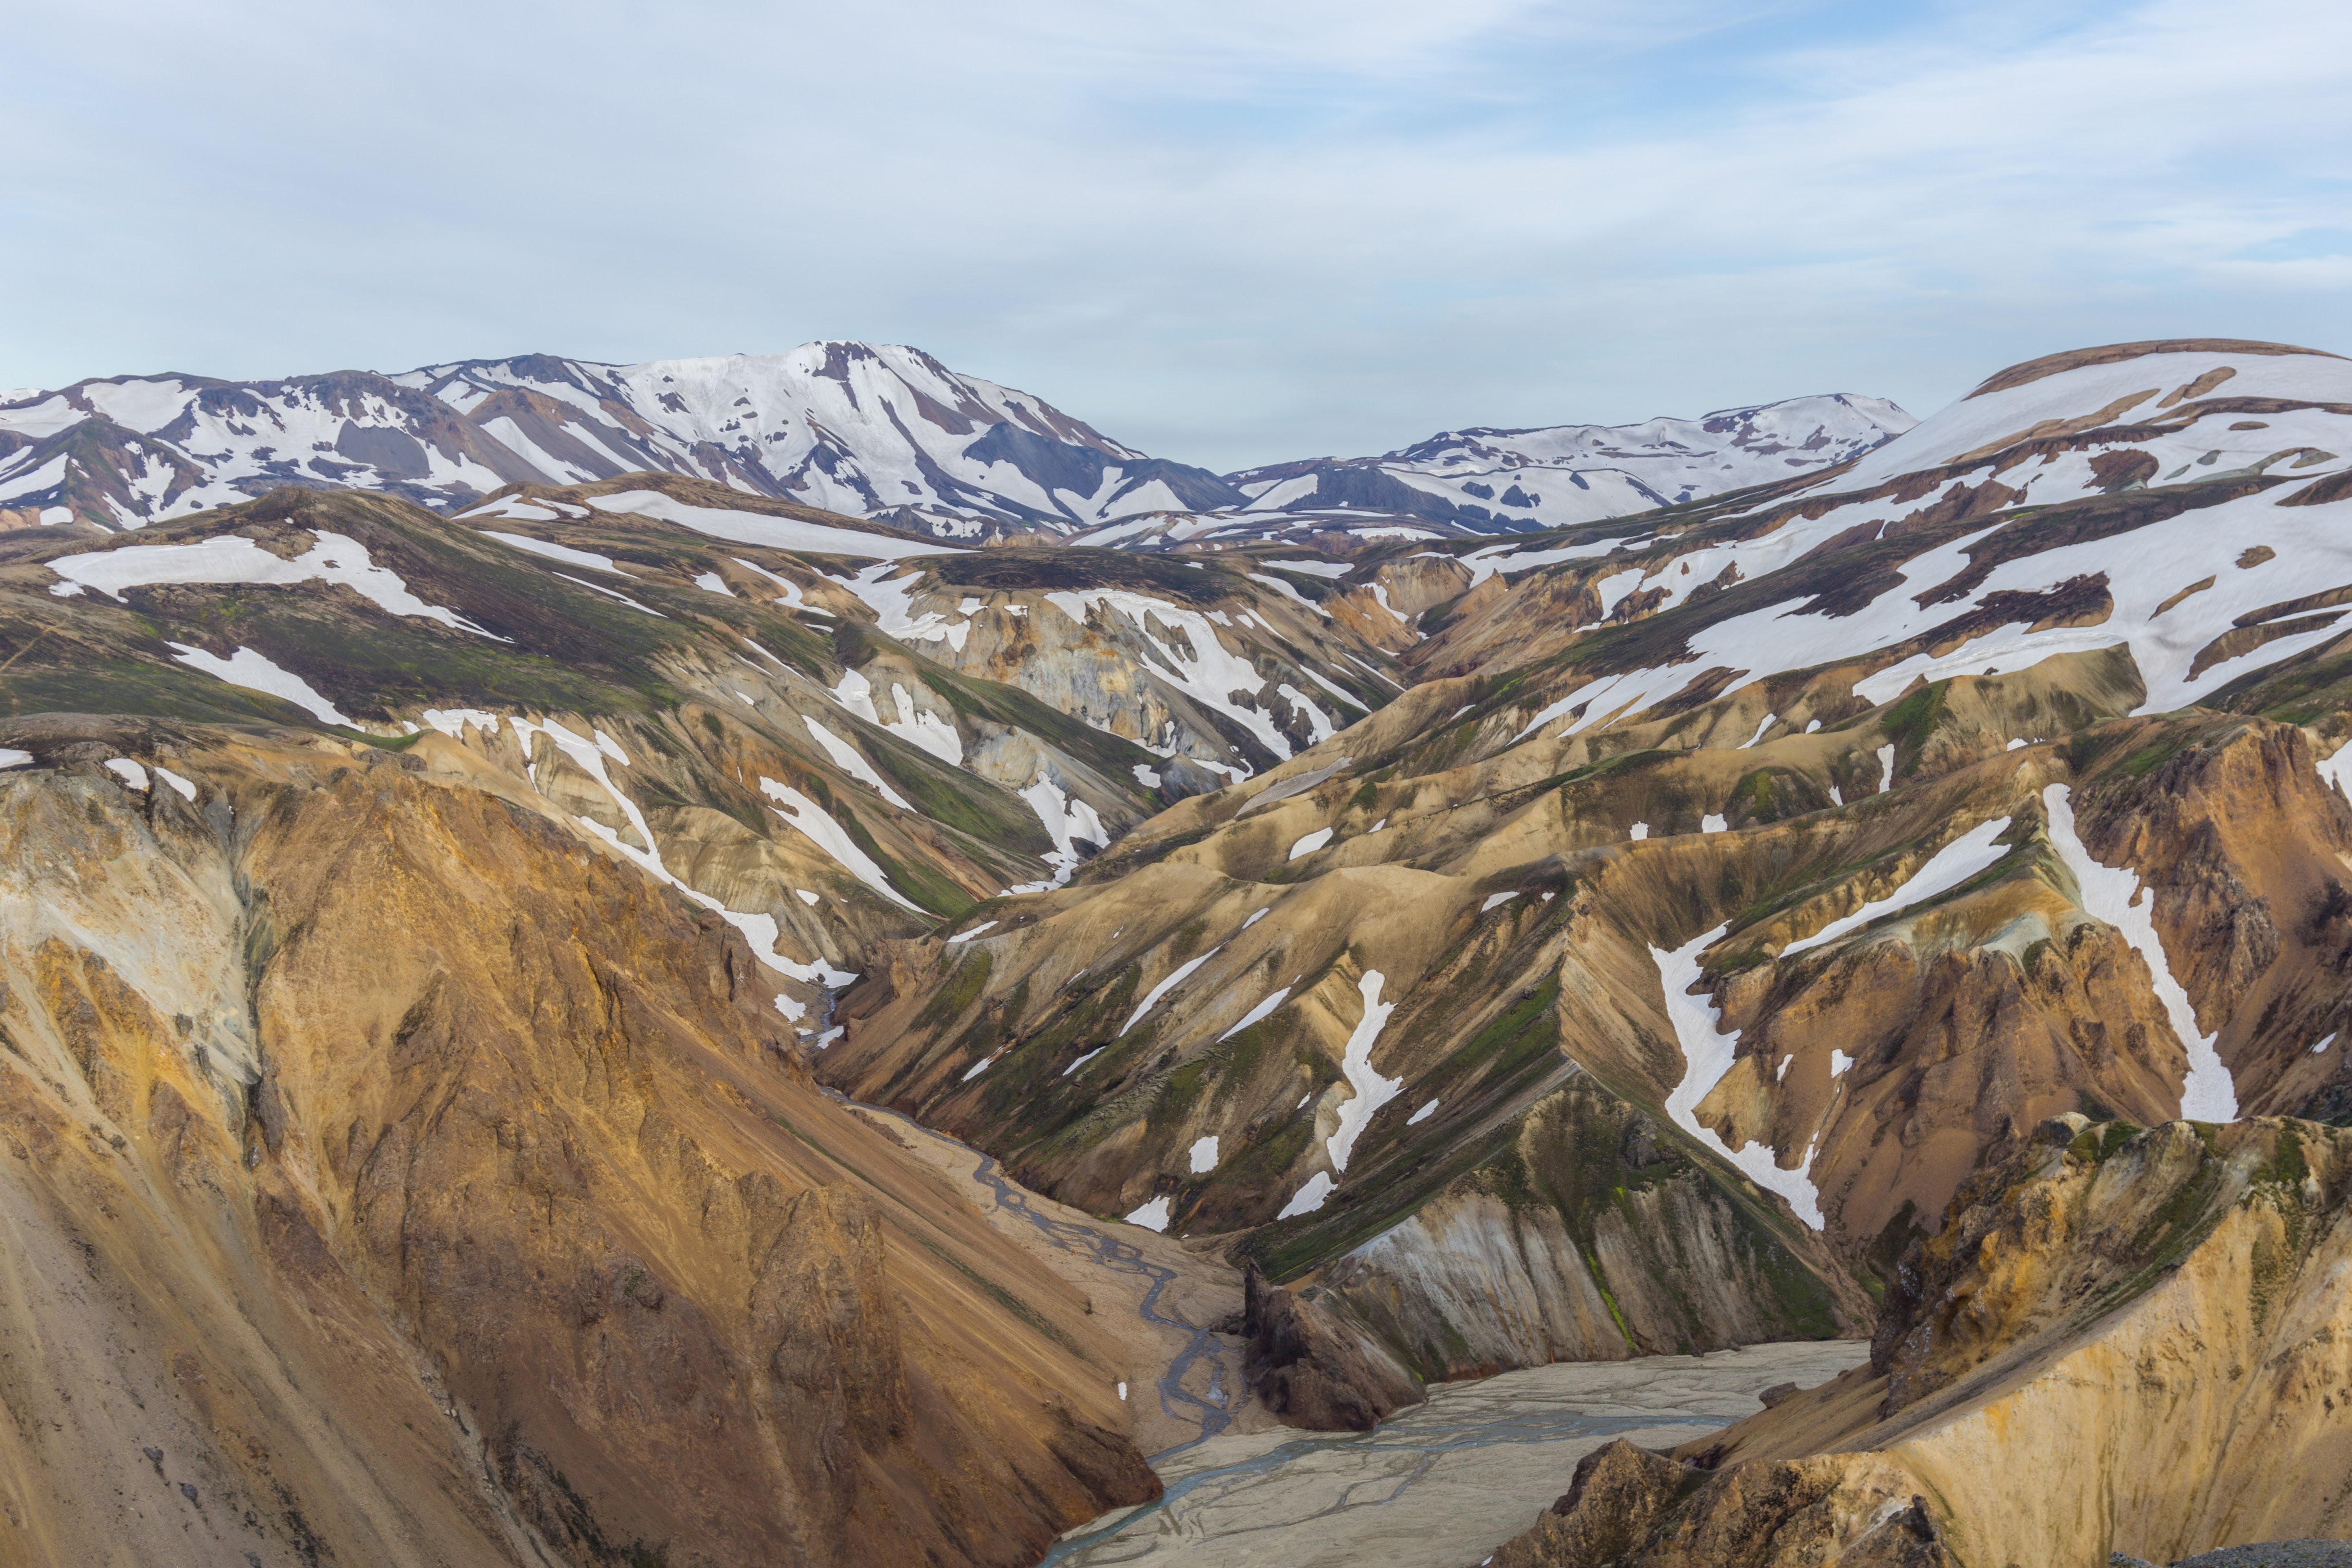 Bláhnúkur Circuit in Landmannalaugar, Iceland – Hiking Is Good